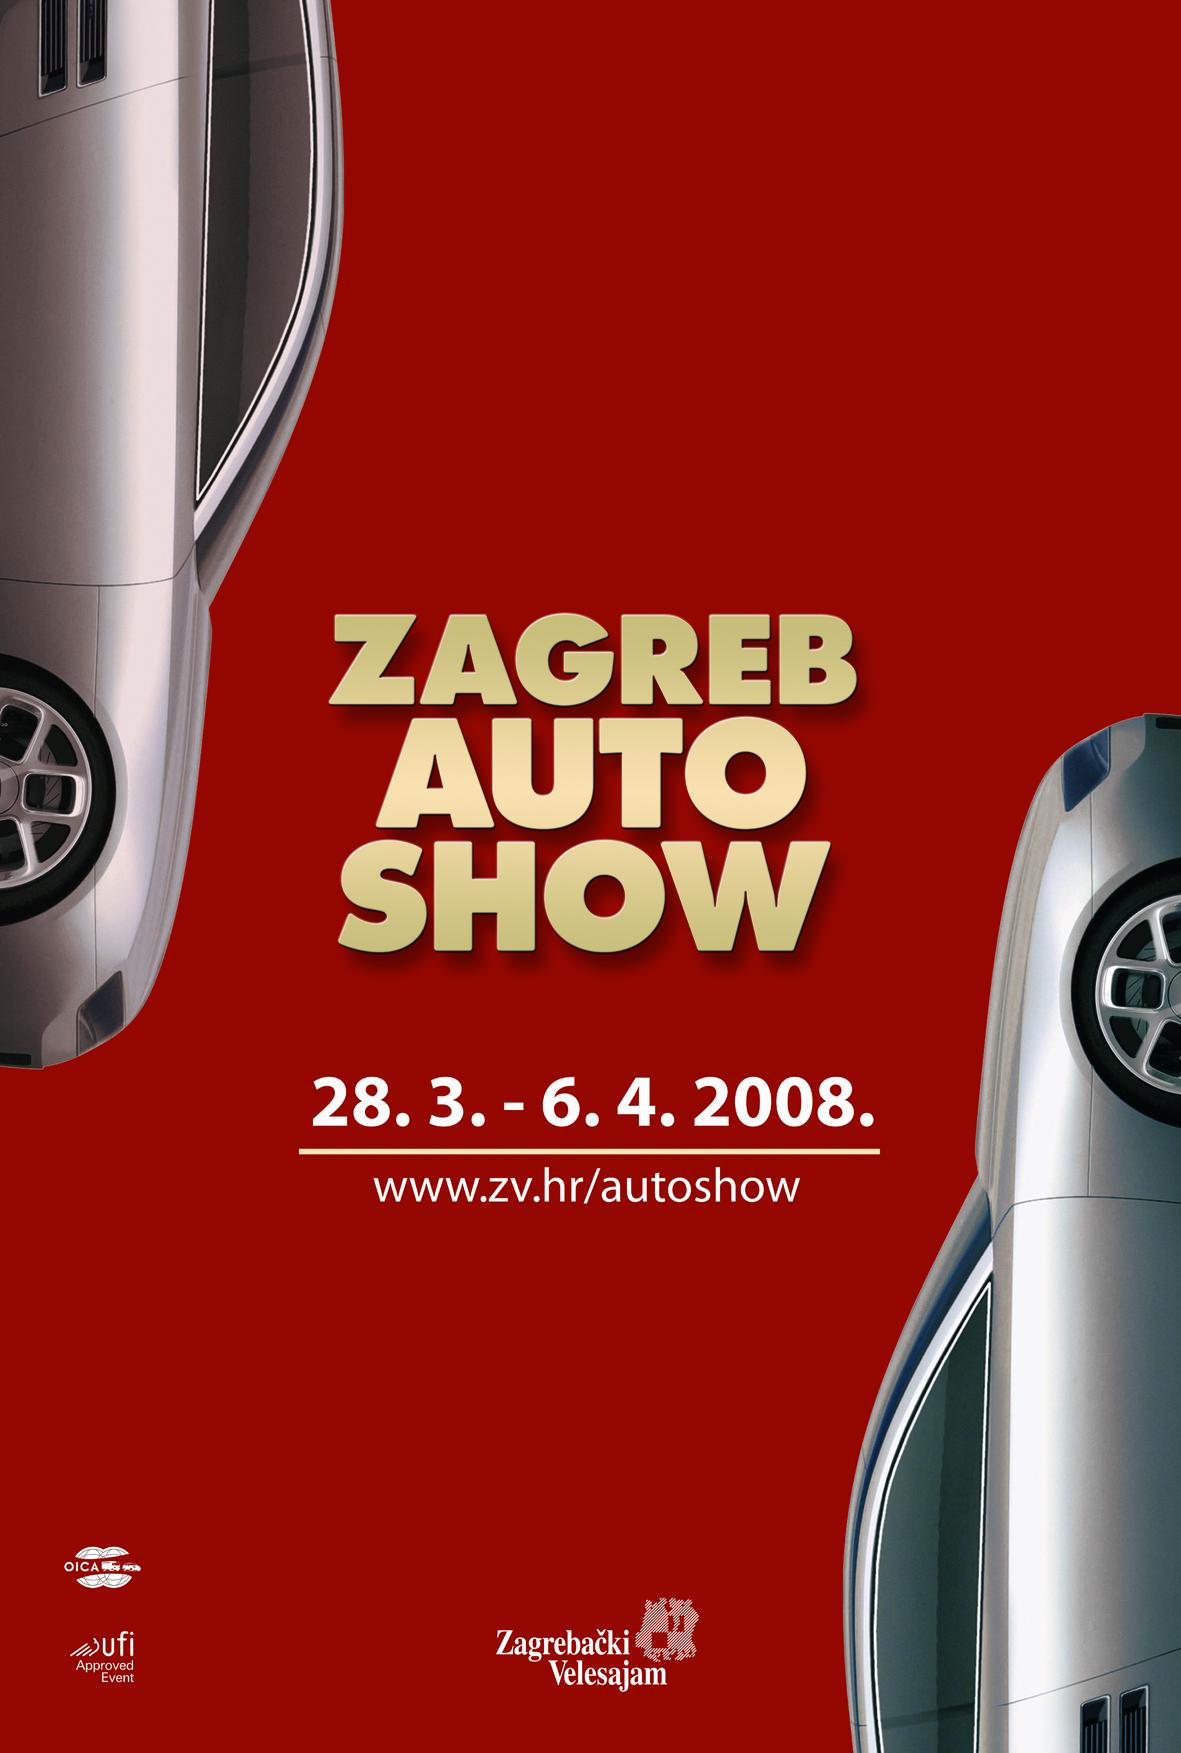 Zagreb Auto Show, poster